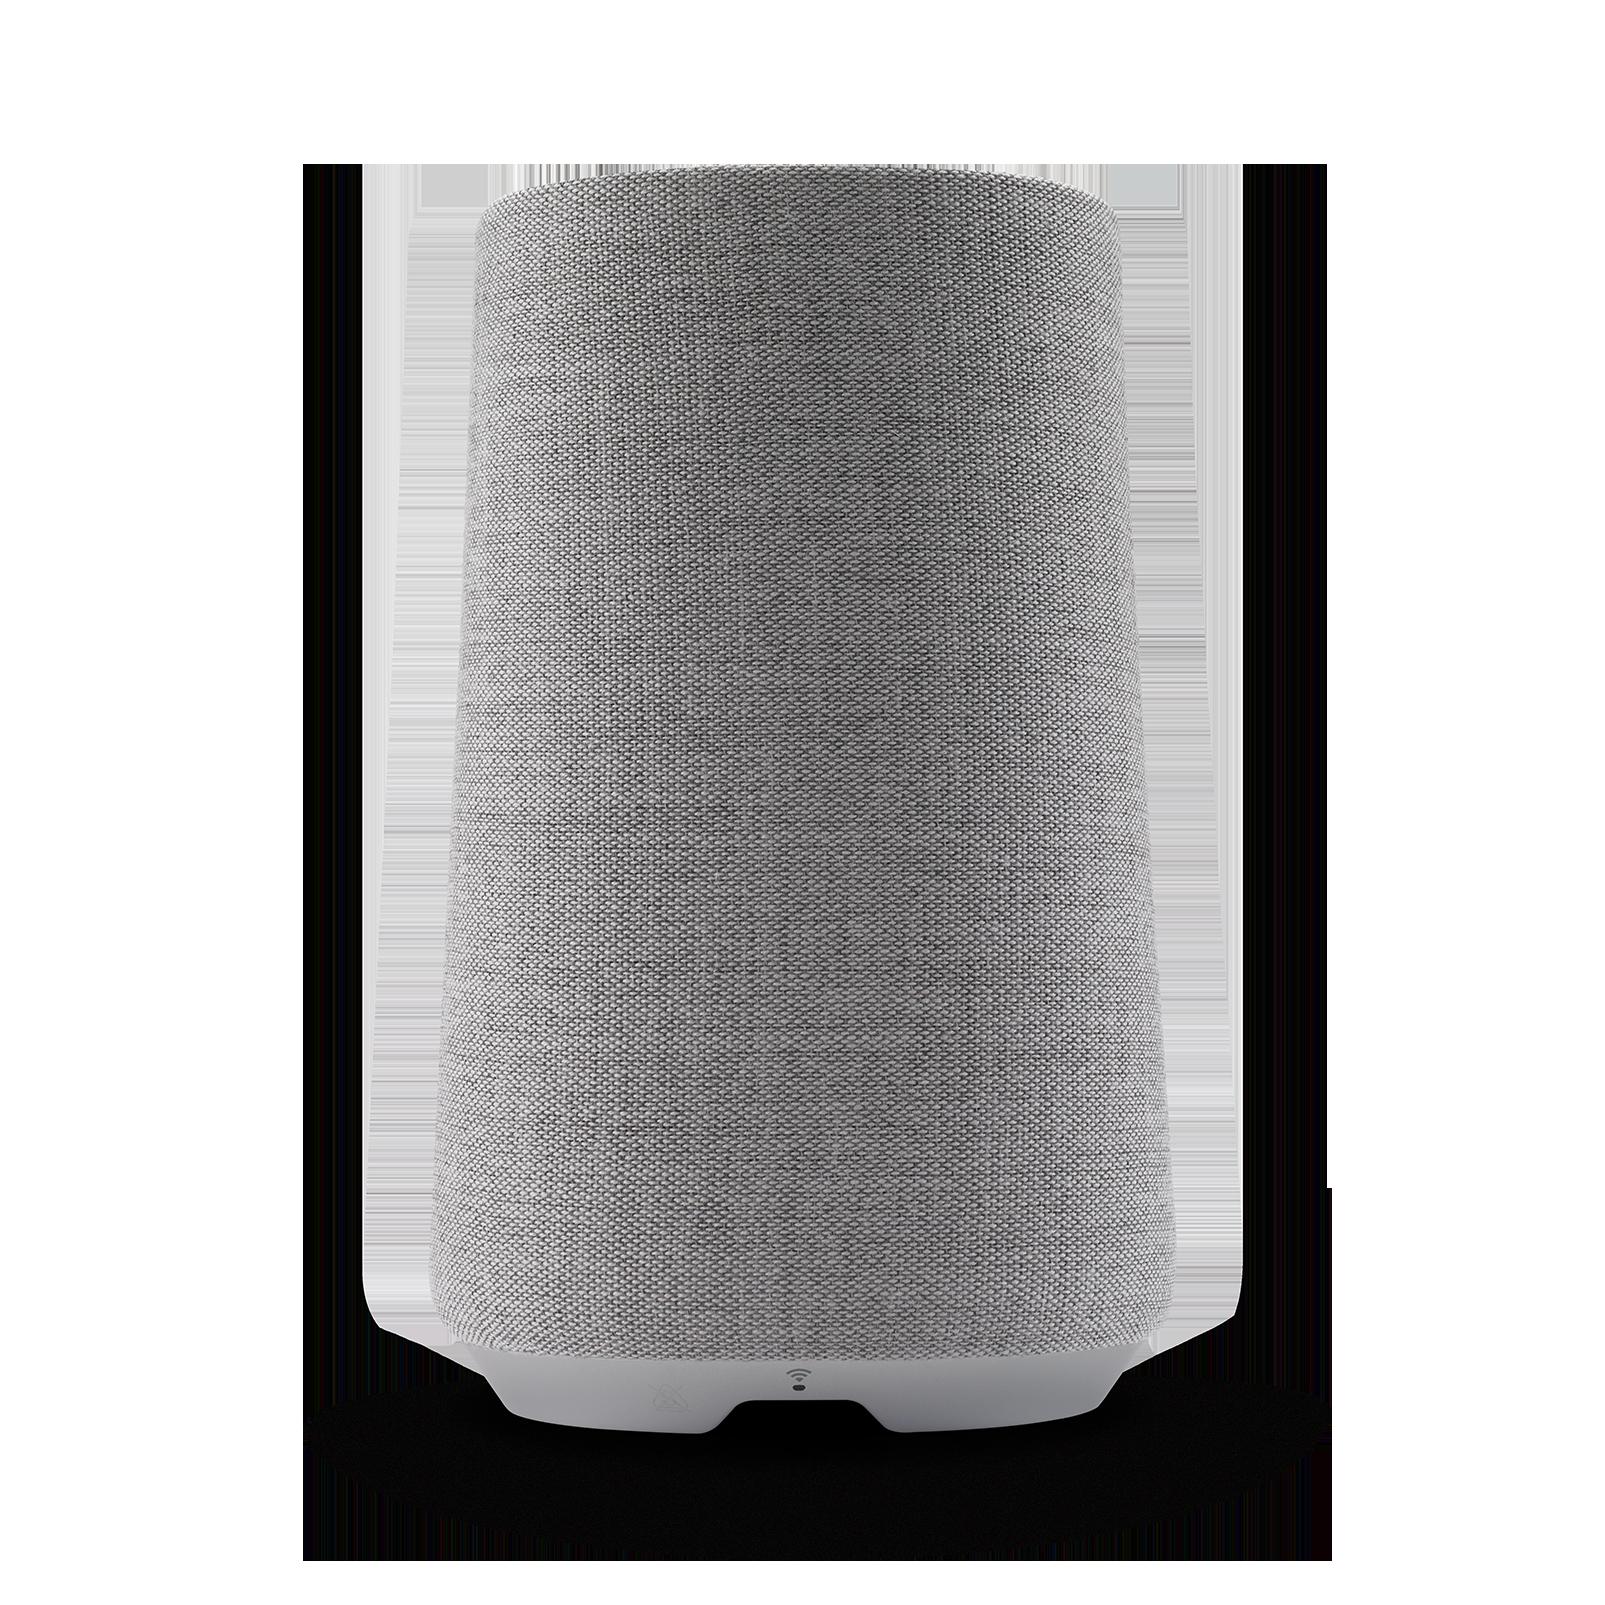 Harman Kardon Citation 100 - Grey - The smallest, smartest home speaker with impactful sound - Back